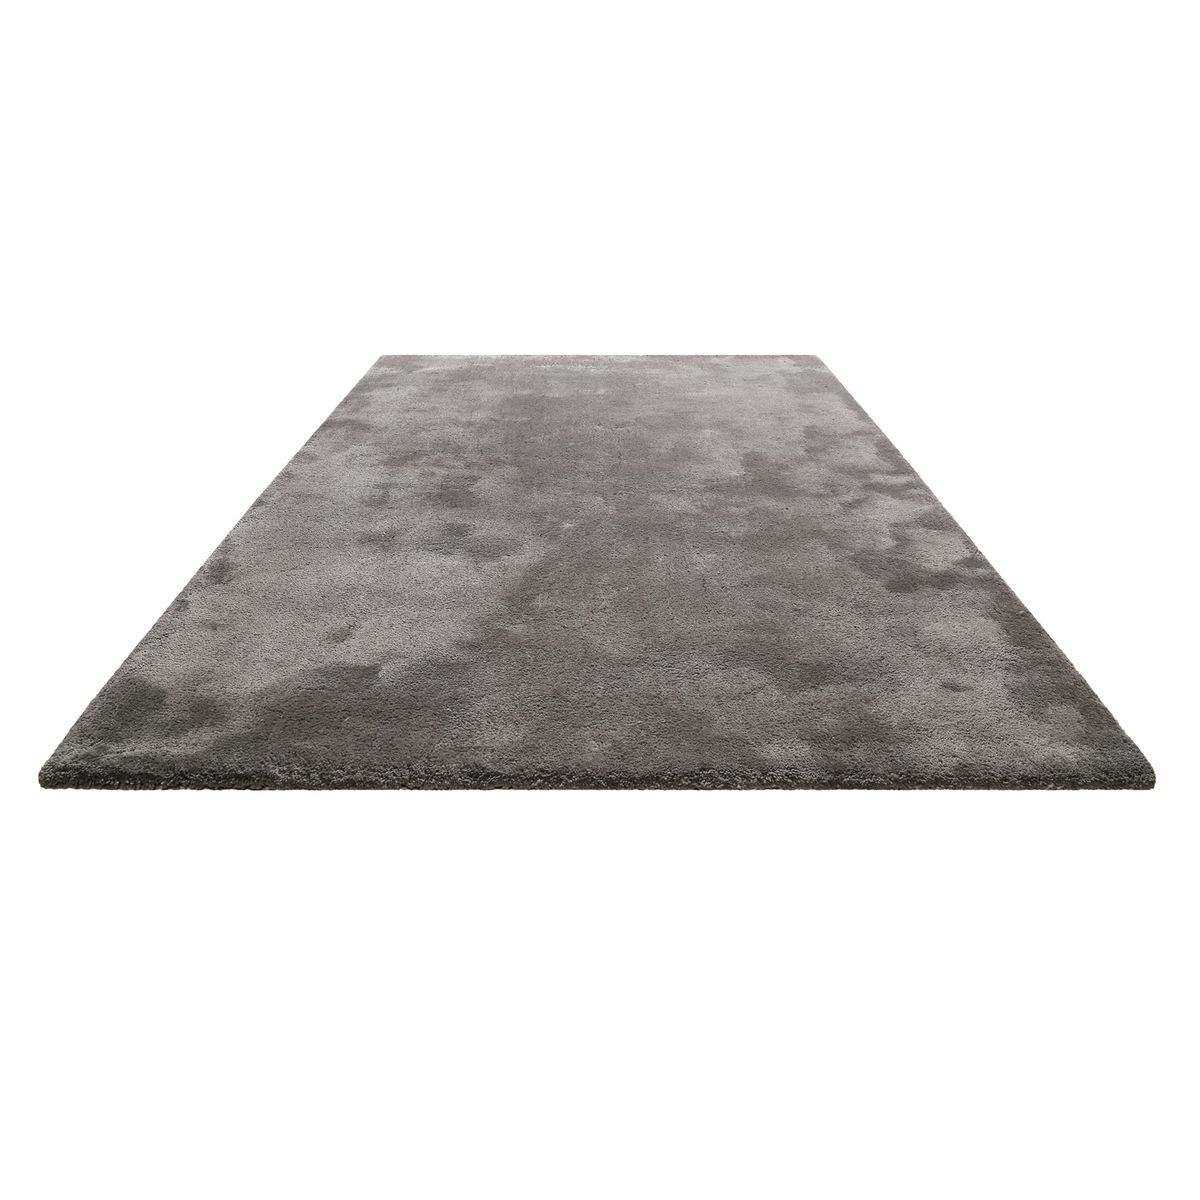 Tapis Sur Chauffage Au Sol tapis pisa | tapis, tapis tissé et chauffage au sol